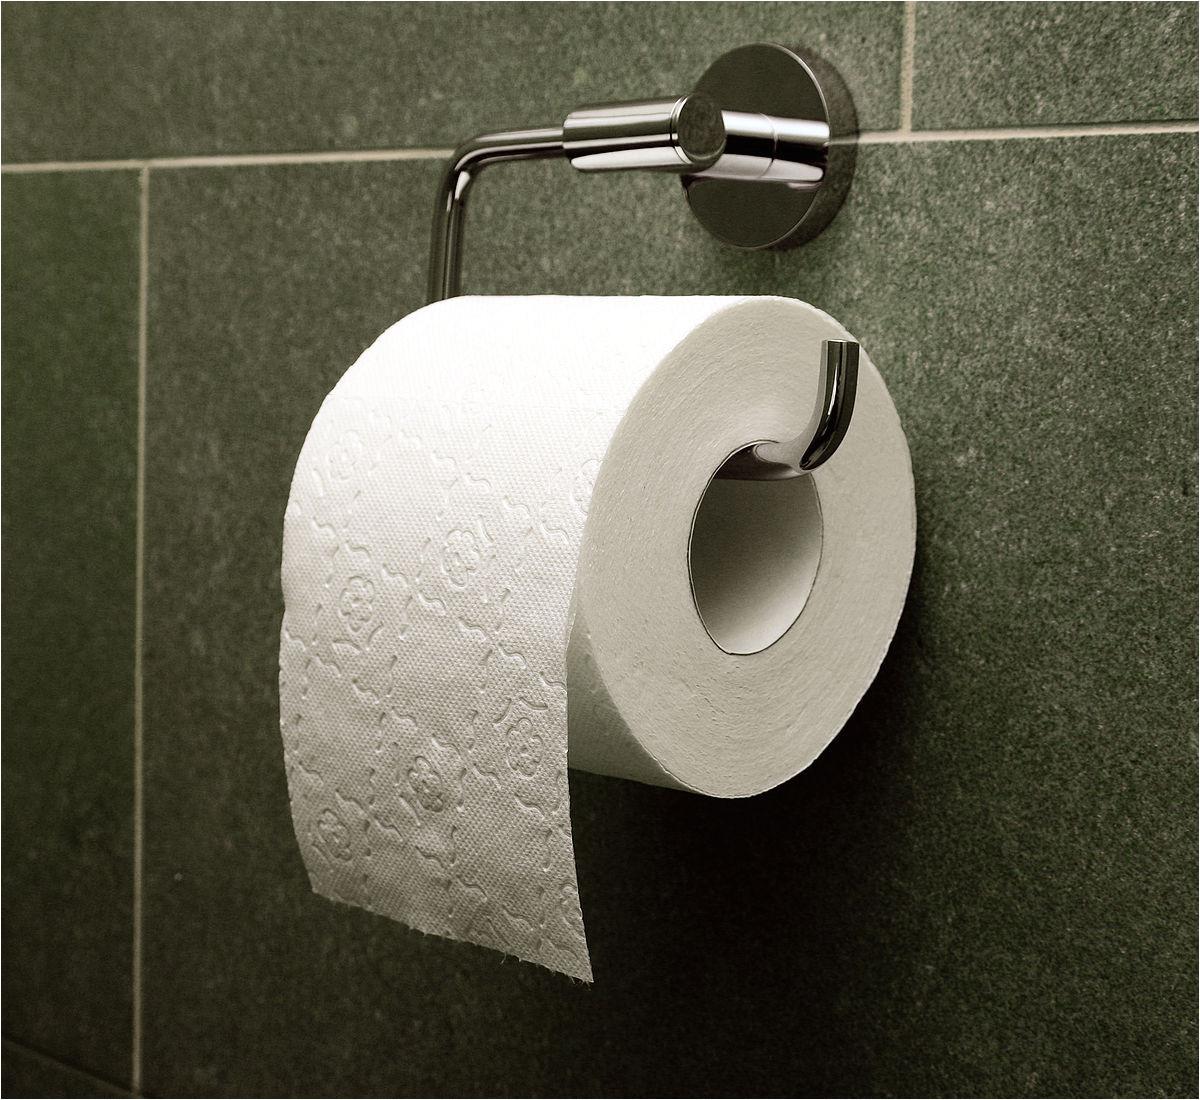 1200px toilet paper orientation over jpg